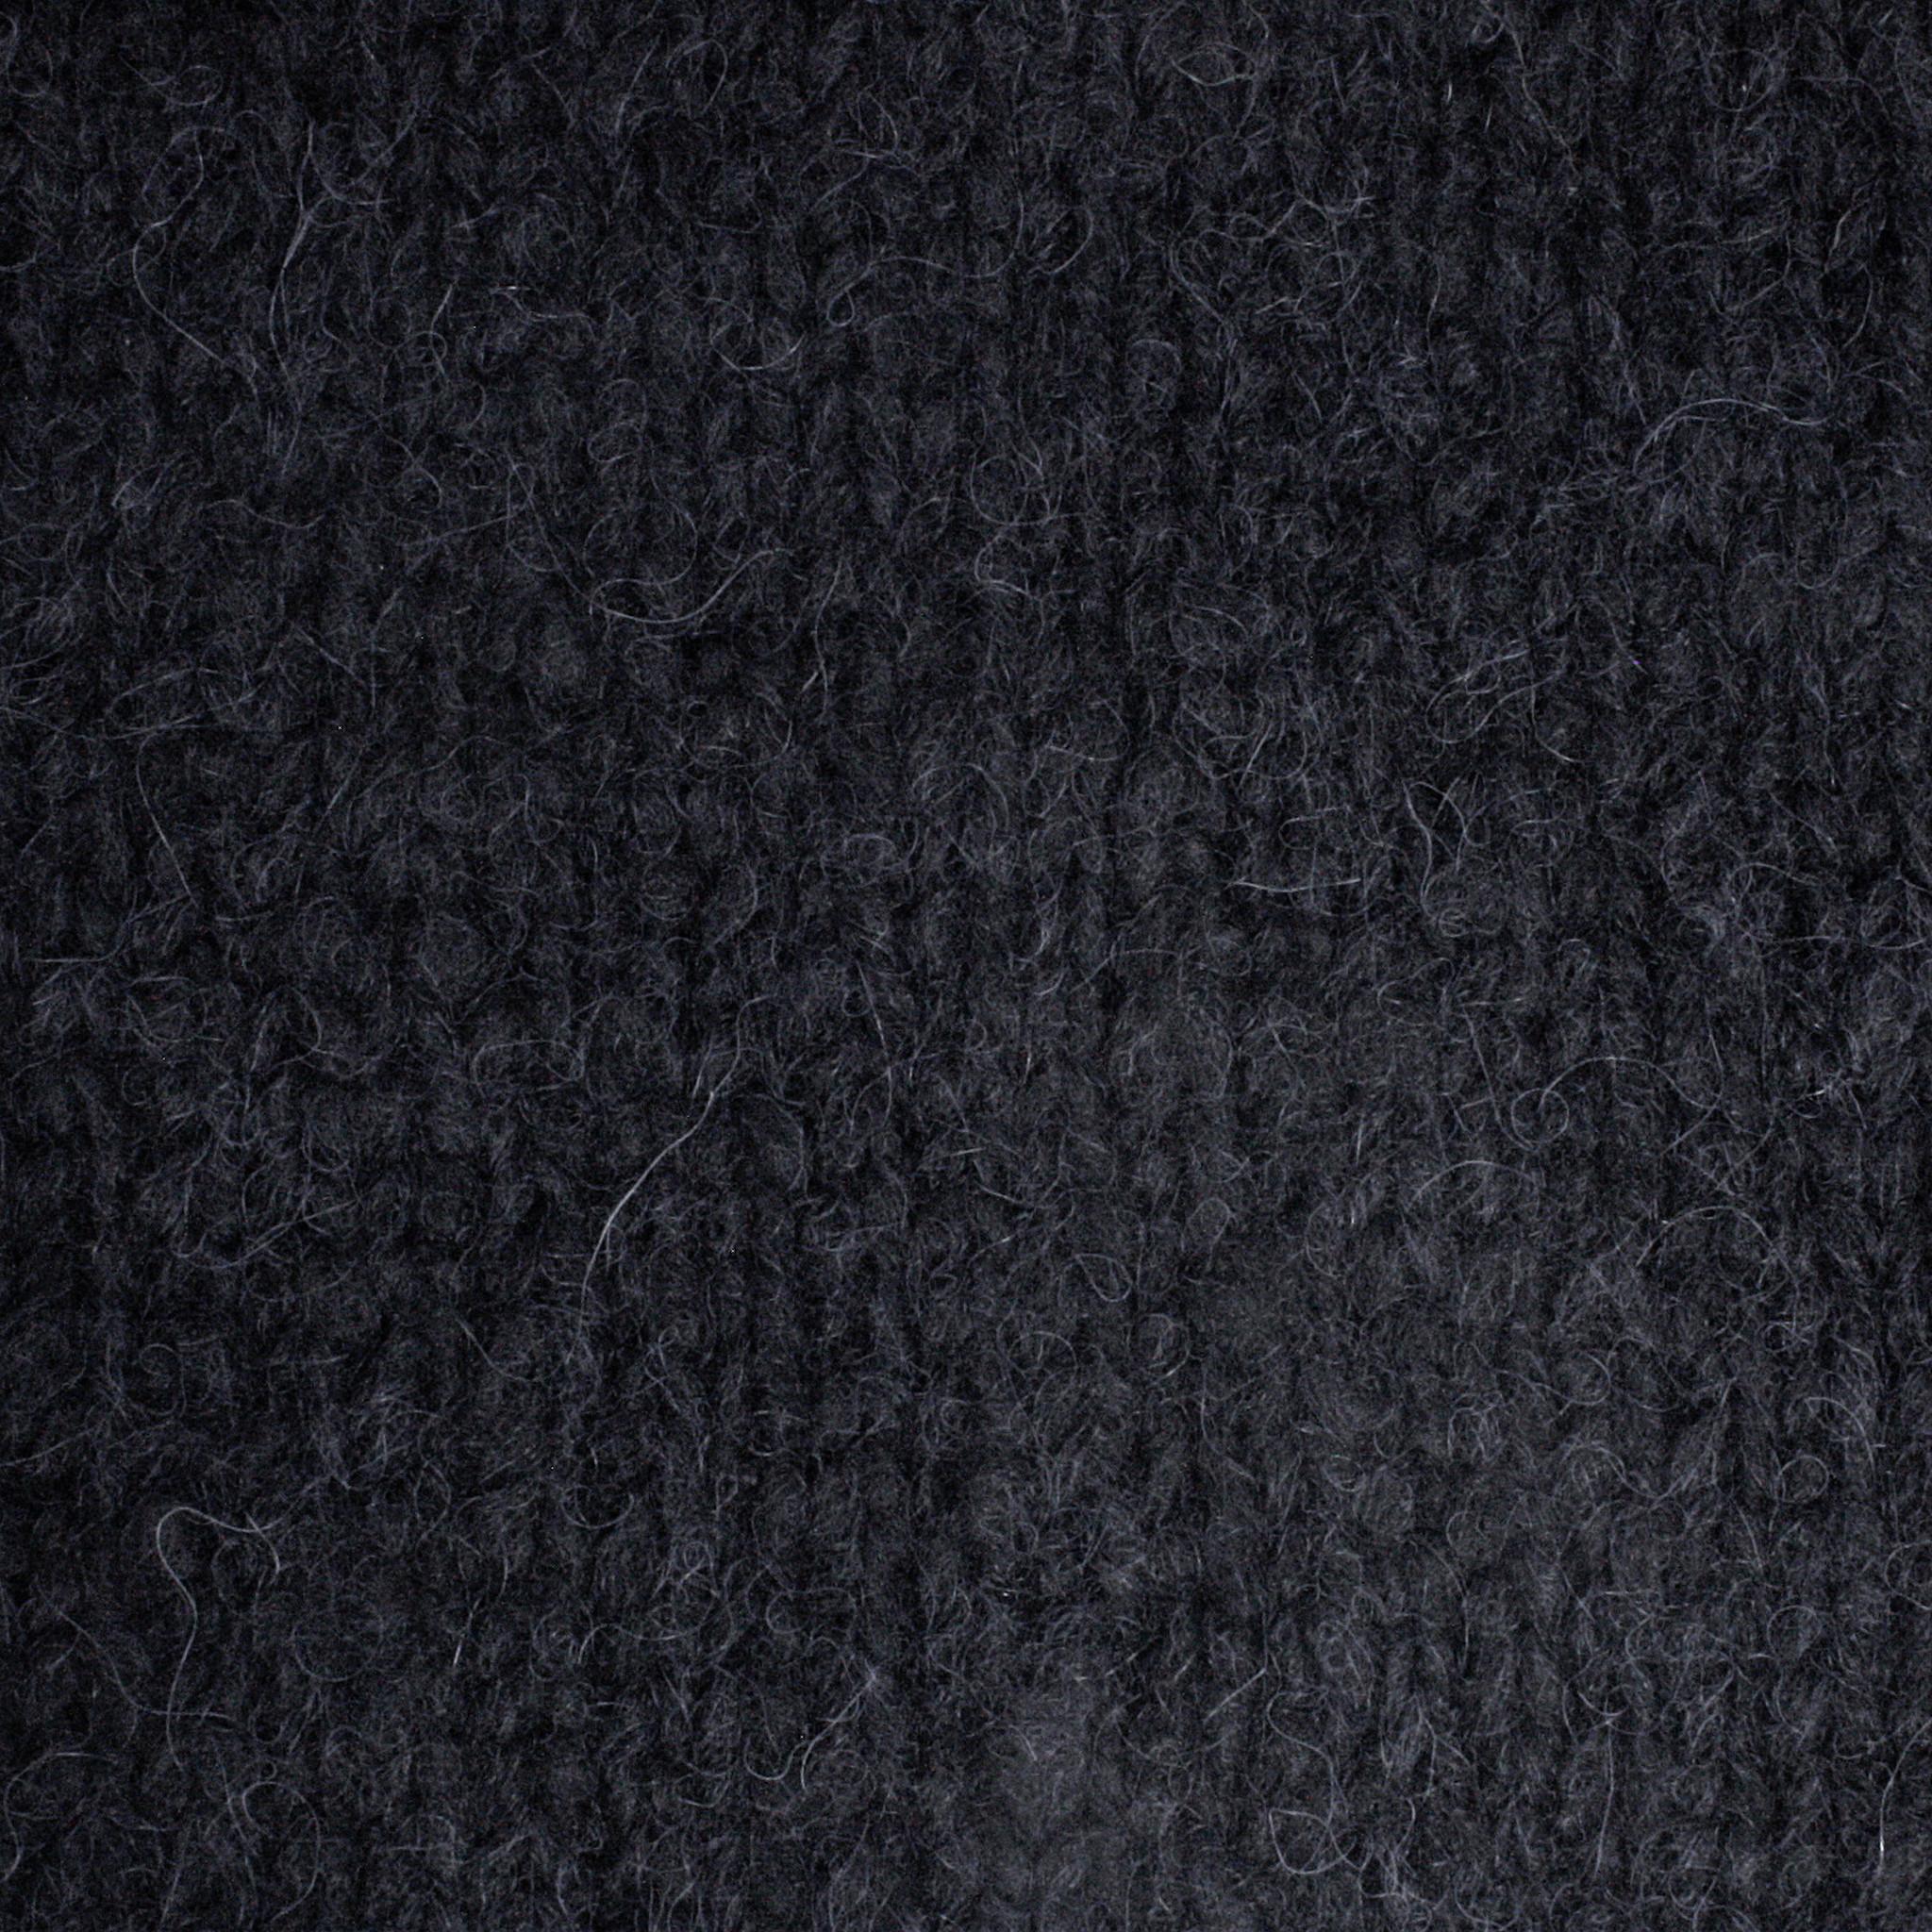 Lang Yarns Trust - 004 - Black